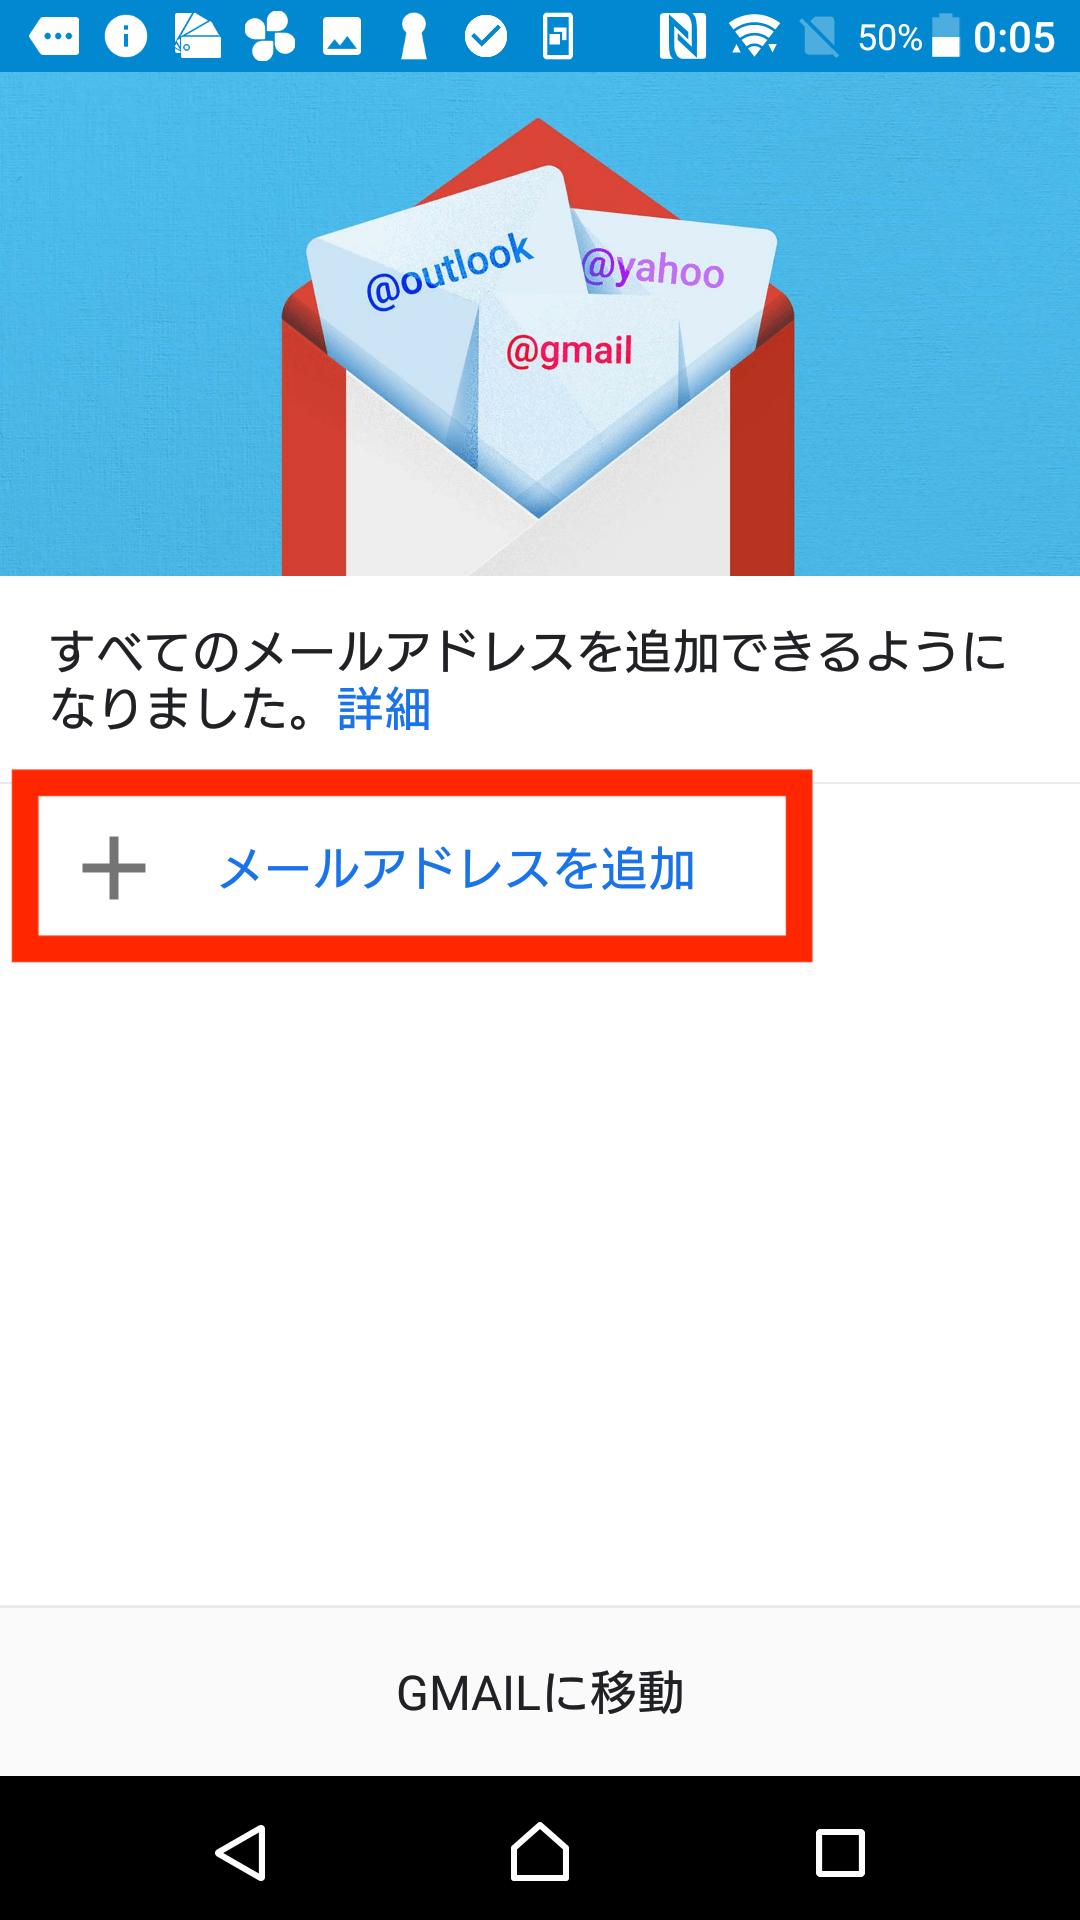 Android Gmailアプリ メールアドレスを追加